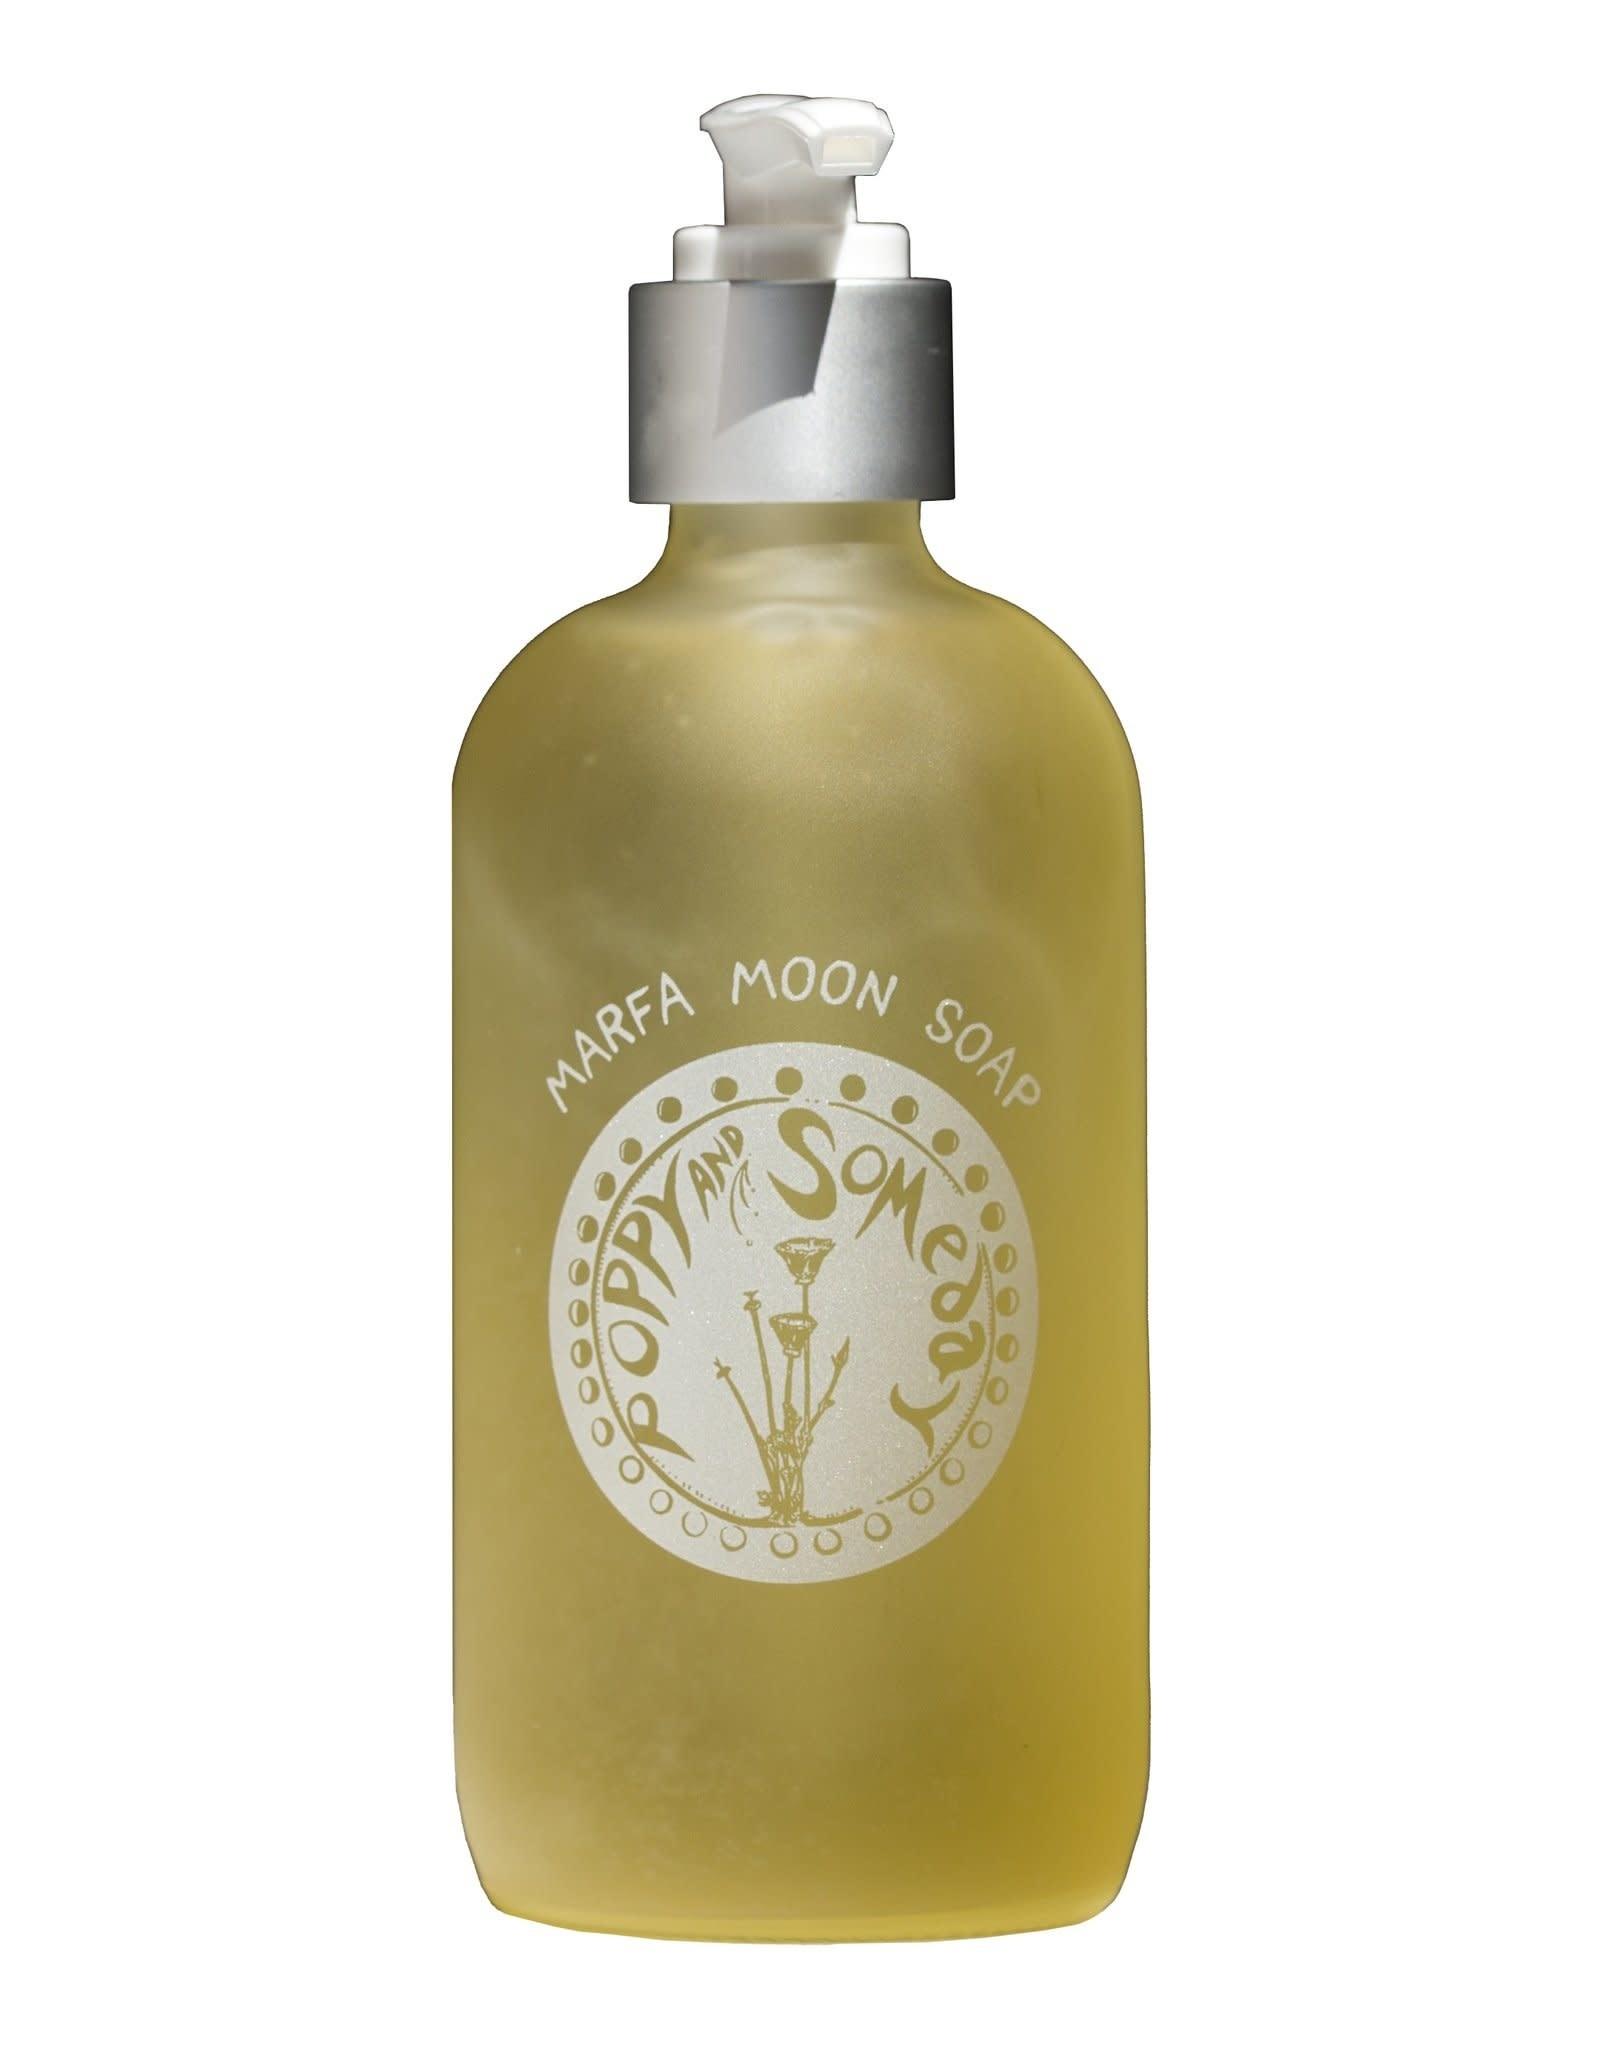 Poppy & Someday Poppy and Someday Marfa Moon Soap